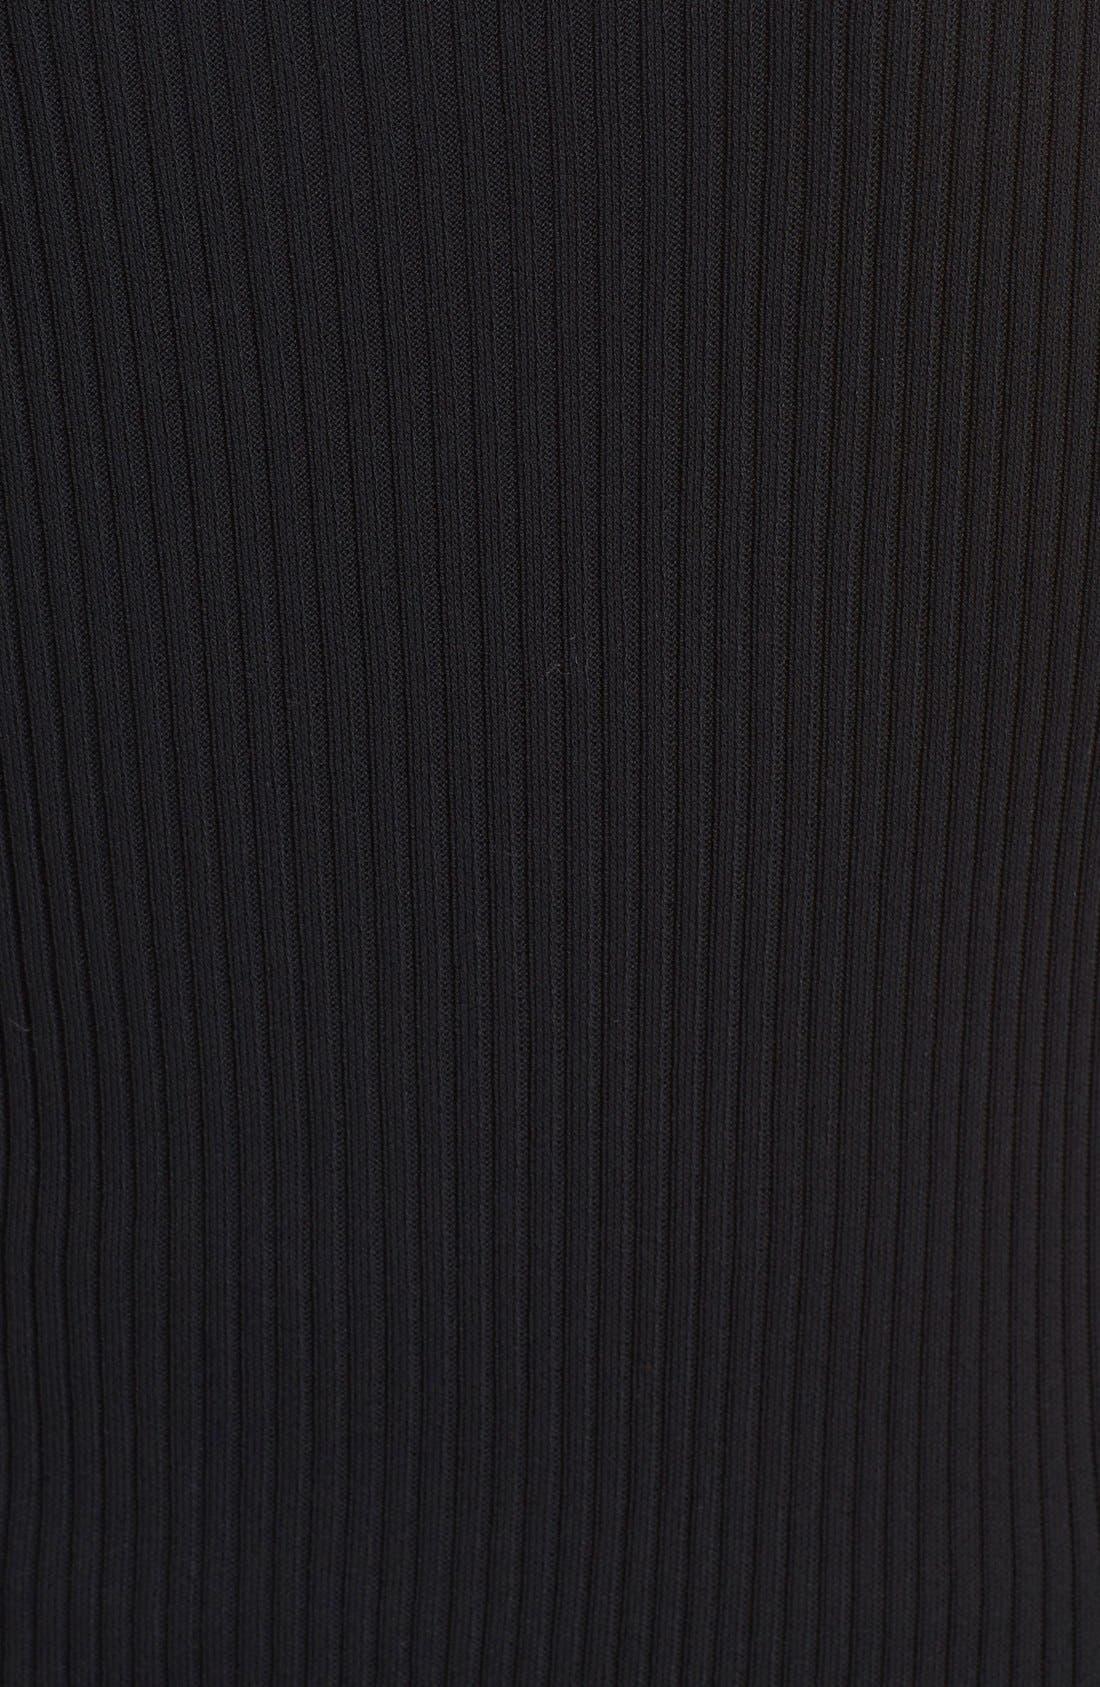 Alternate Image 3  - Fuzzi Asymmetrical Rib Knit Tank Dress